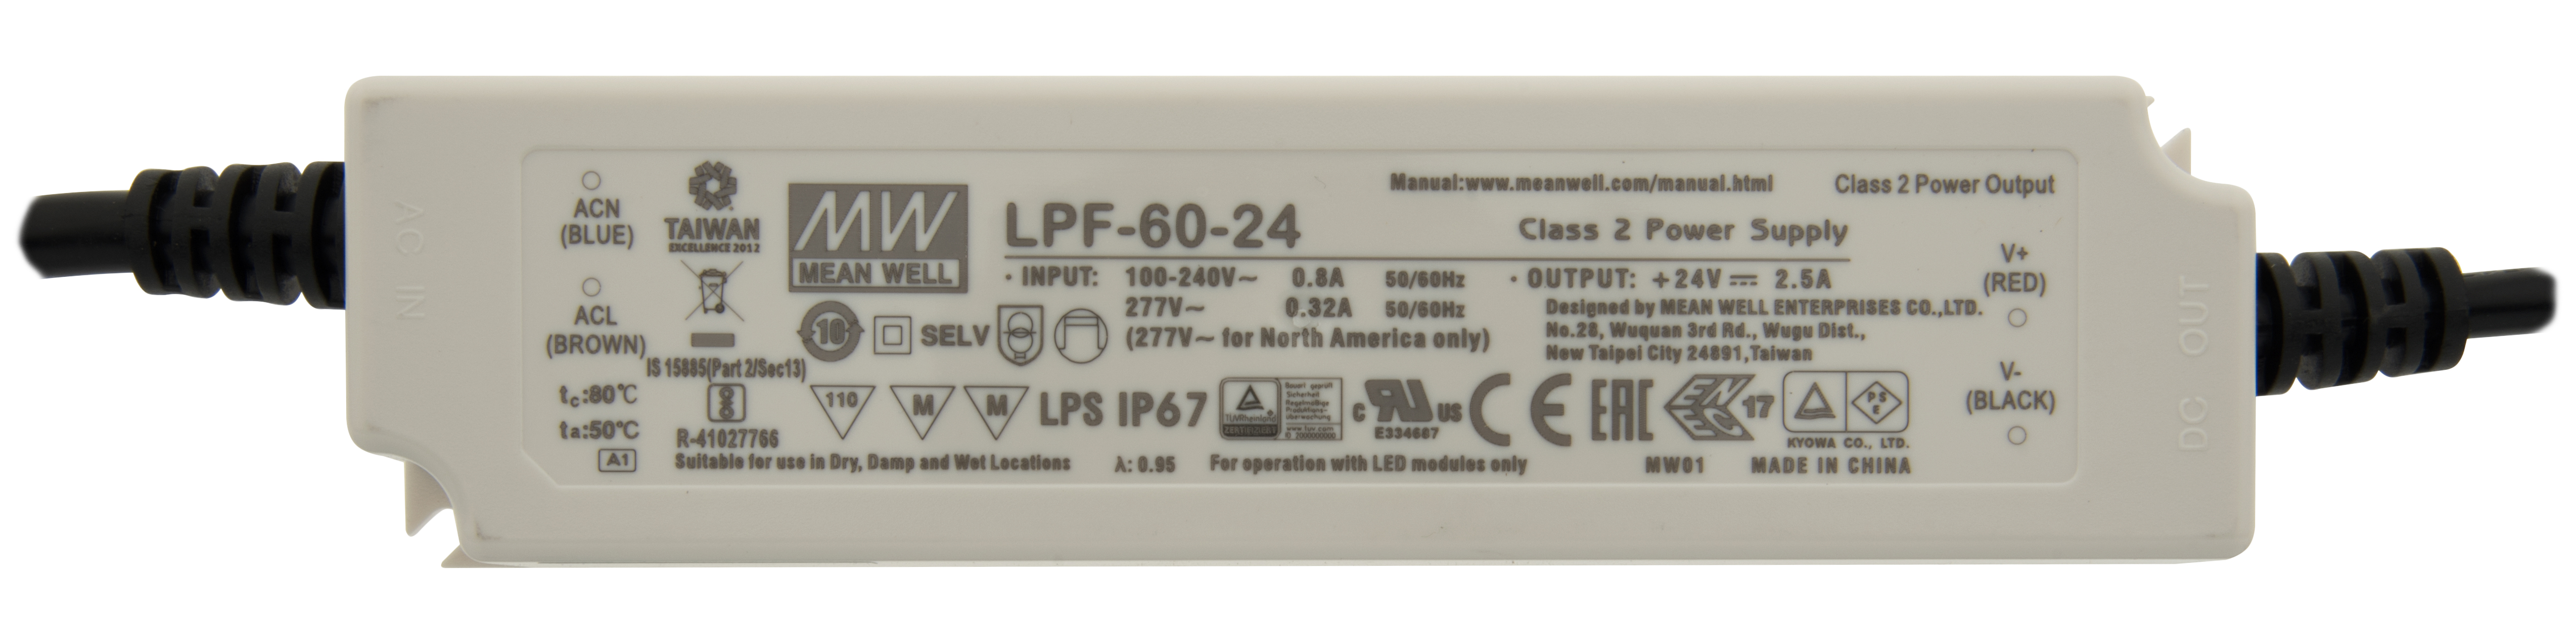 1 Stk LED LPF - Netzteil 25W/48V MM IP67 LINT048025